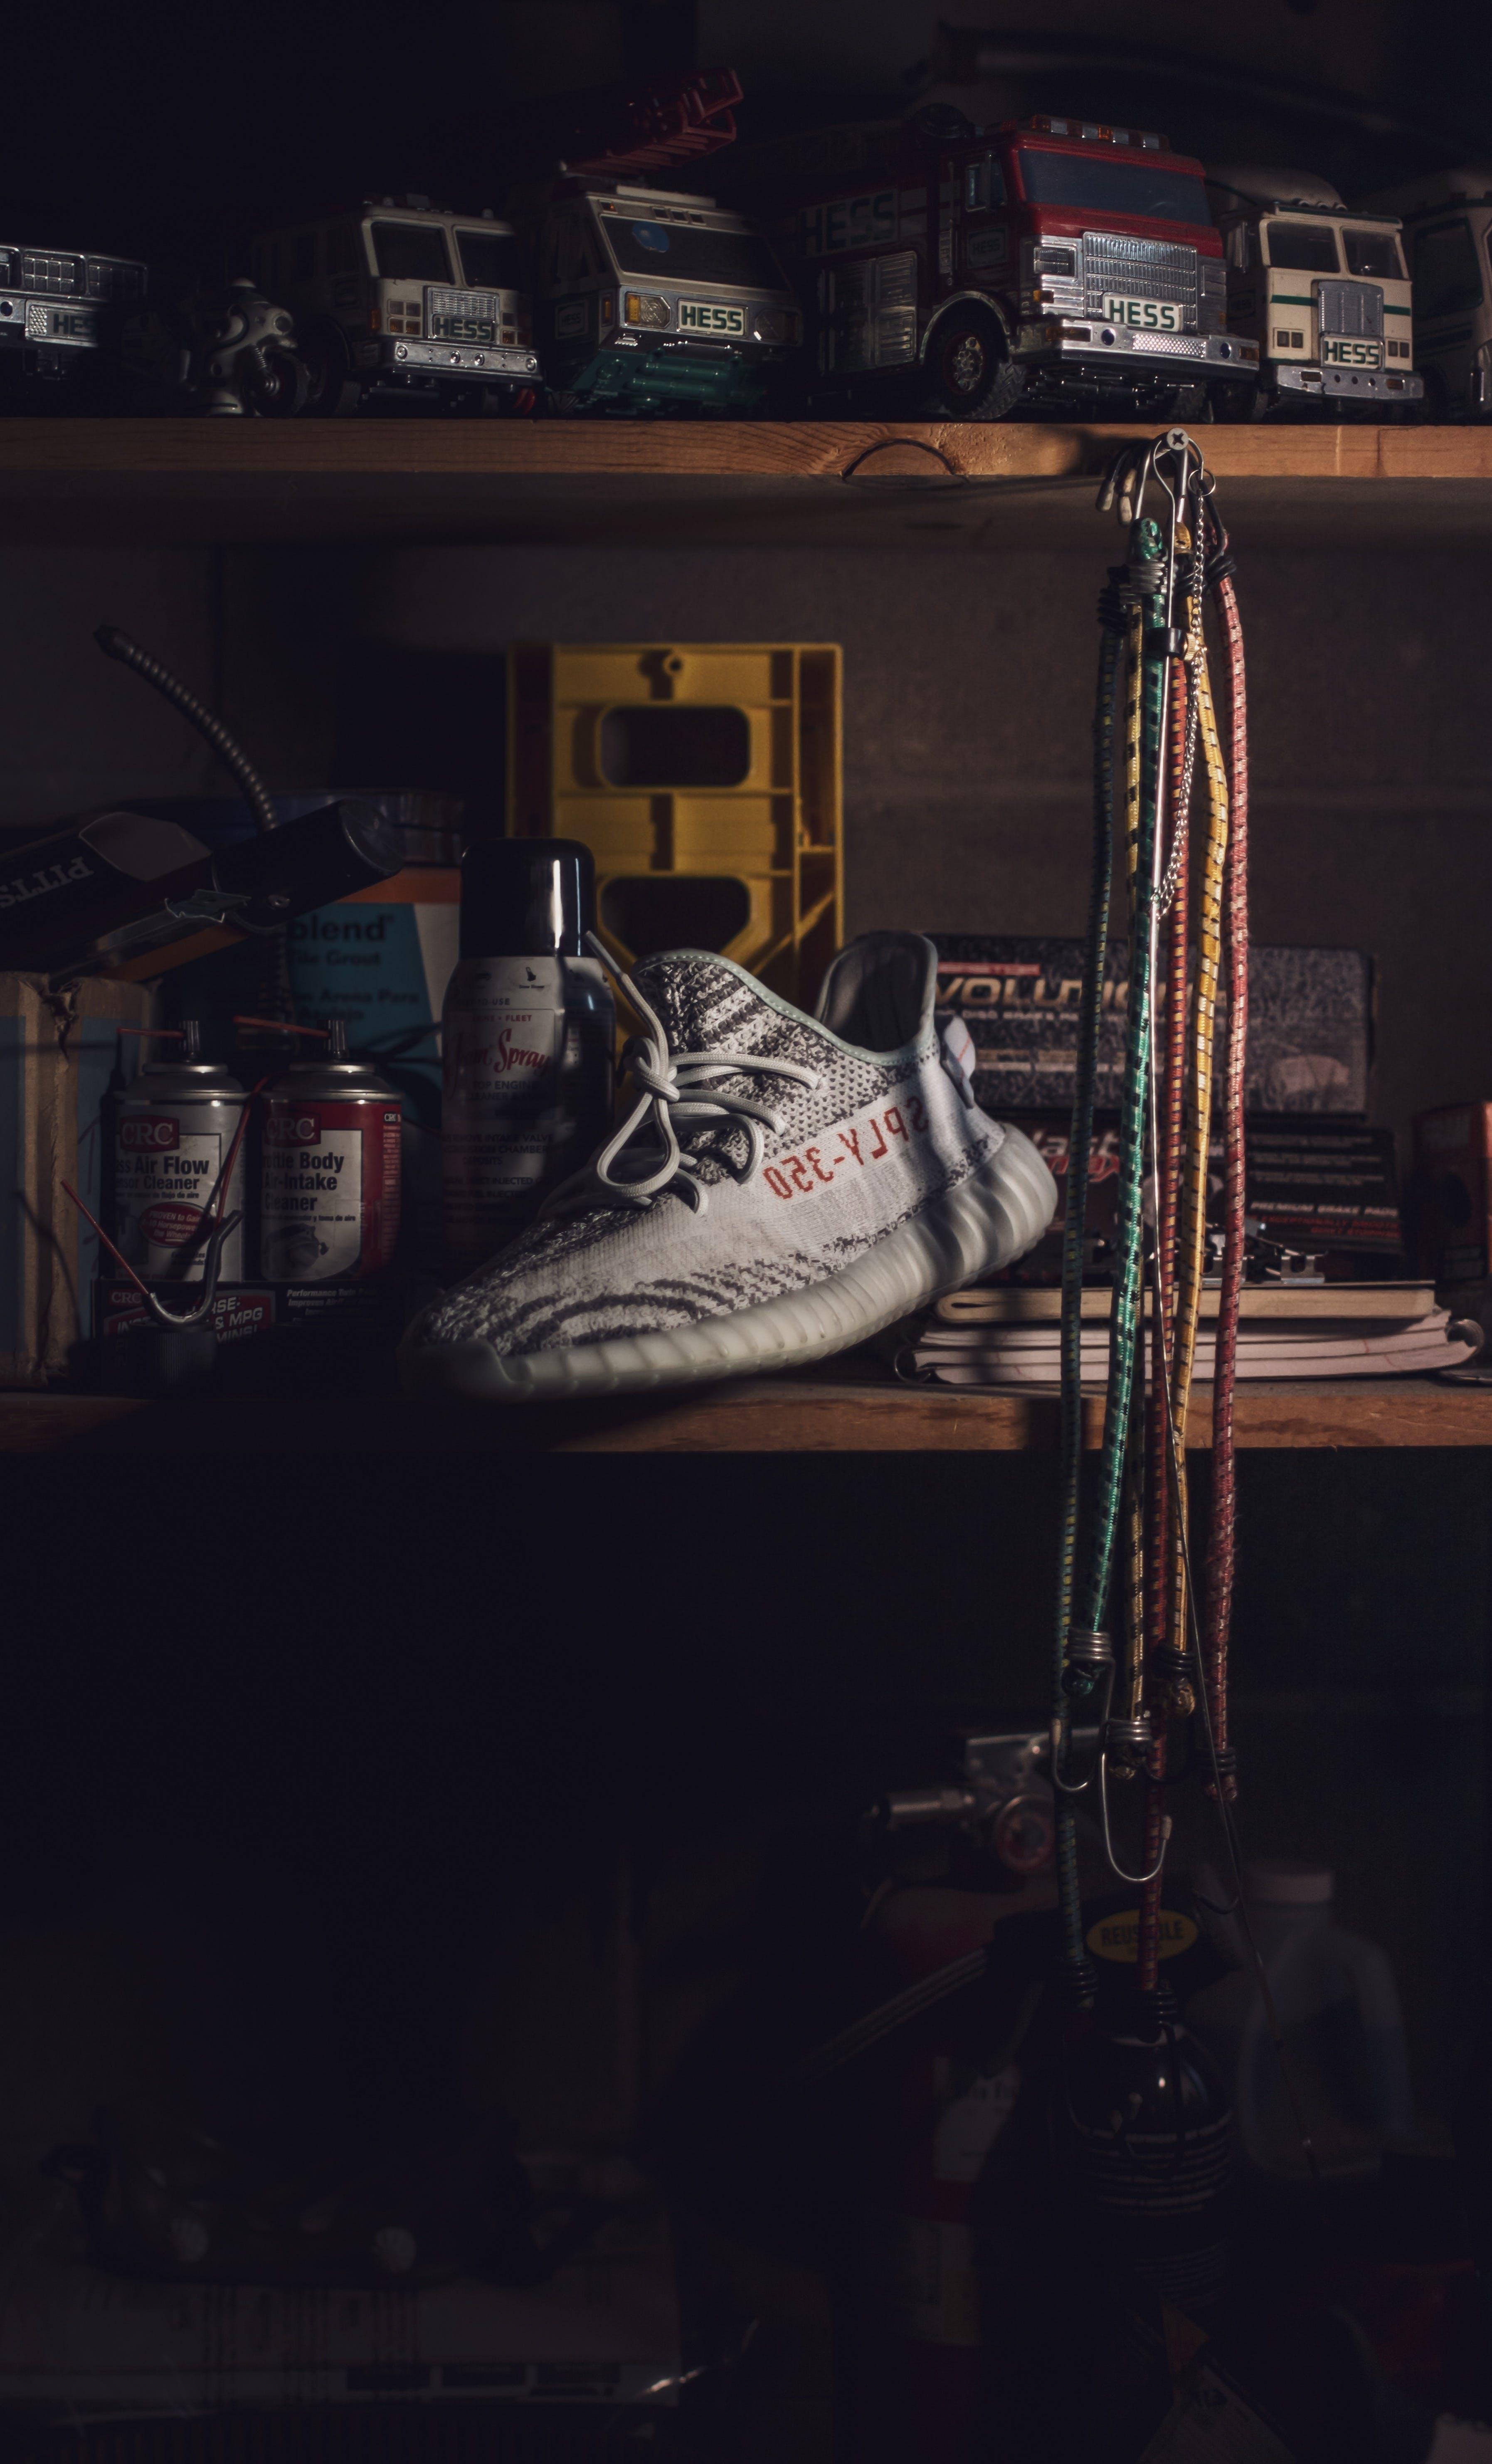 Unpaired Beluga Adidas Yeezy Boost 350 Shoe